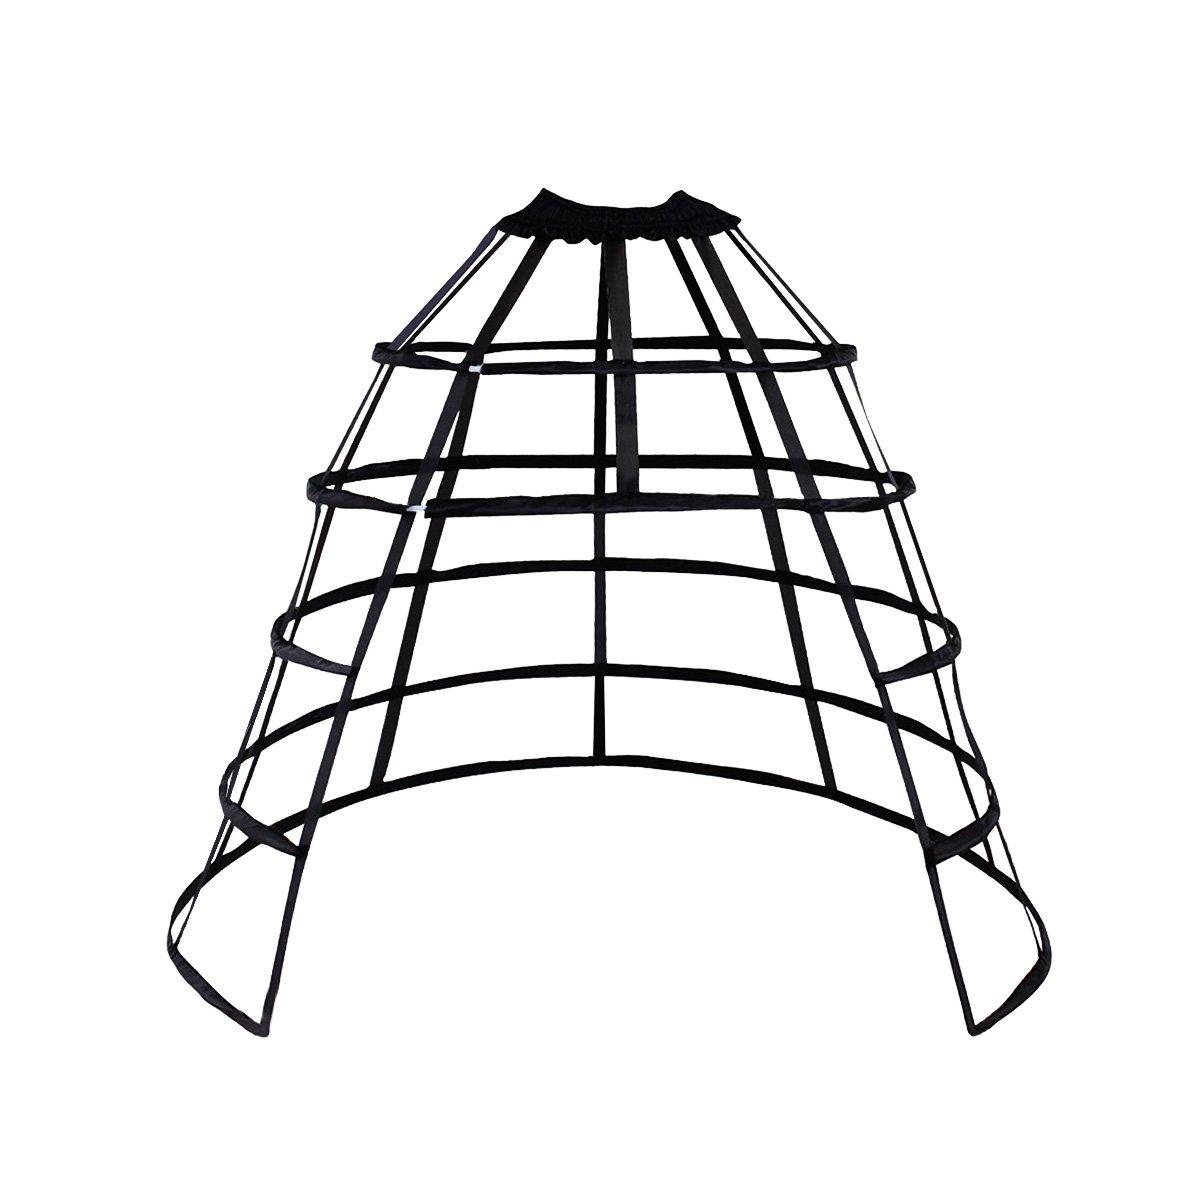 Renaissance 5-Hoop Black Open Front Pannier Cage - DeluxeAdultCostumes.com